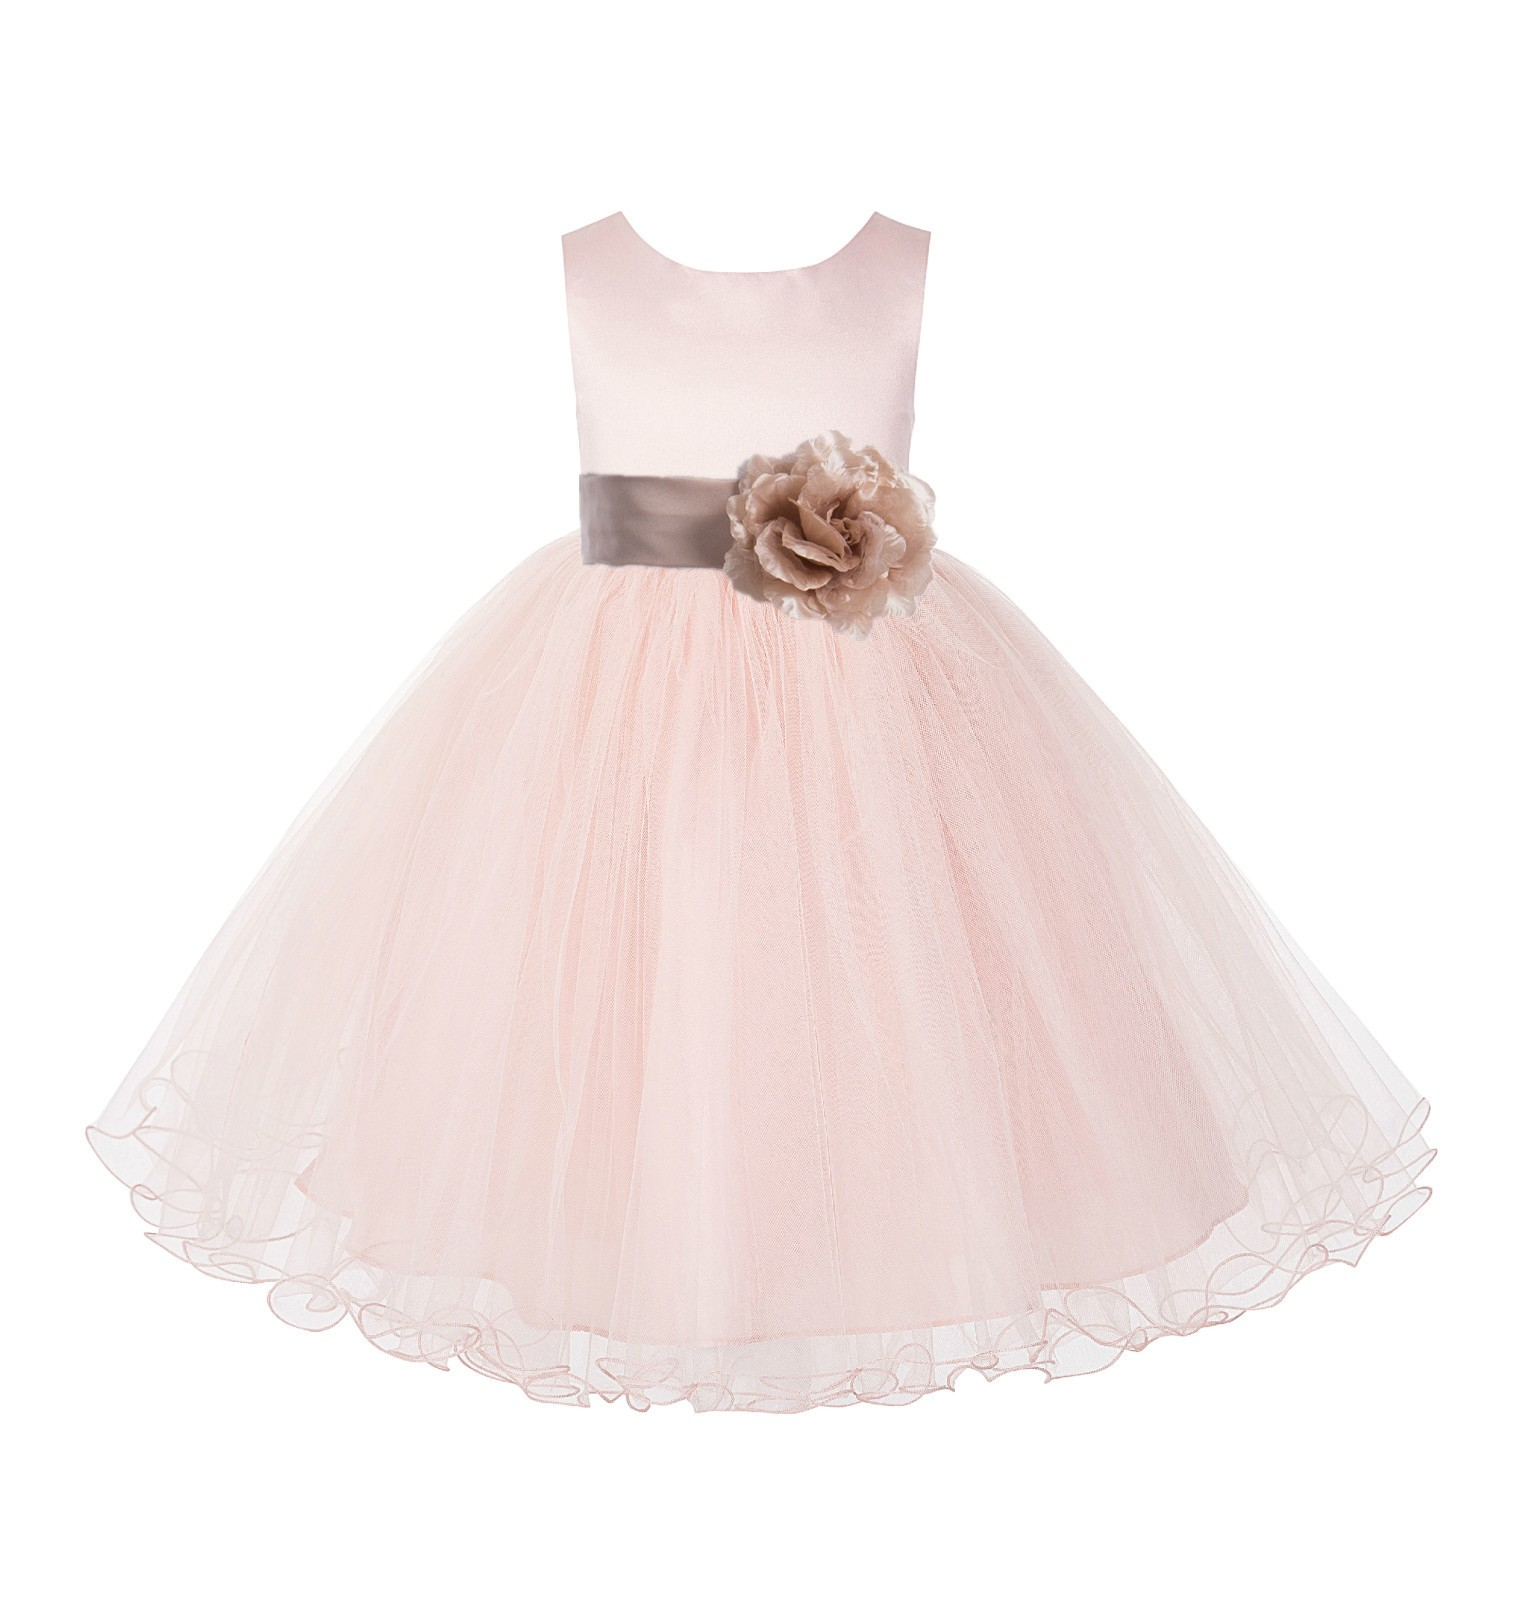 Blush Pink /Rose gold Tulle Rattail Edge Flower Girl Dress Pageant Recital 829S